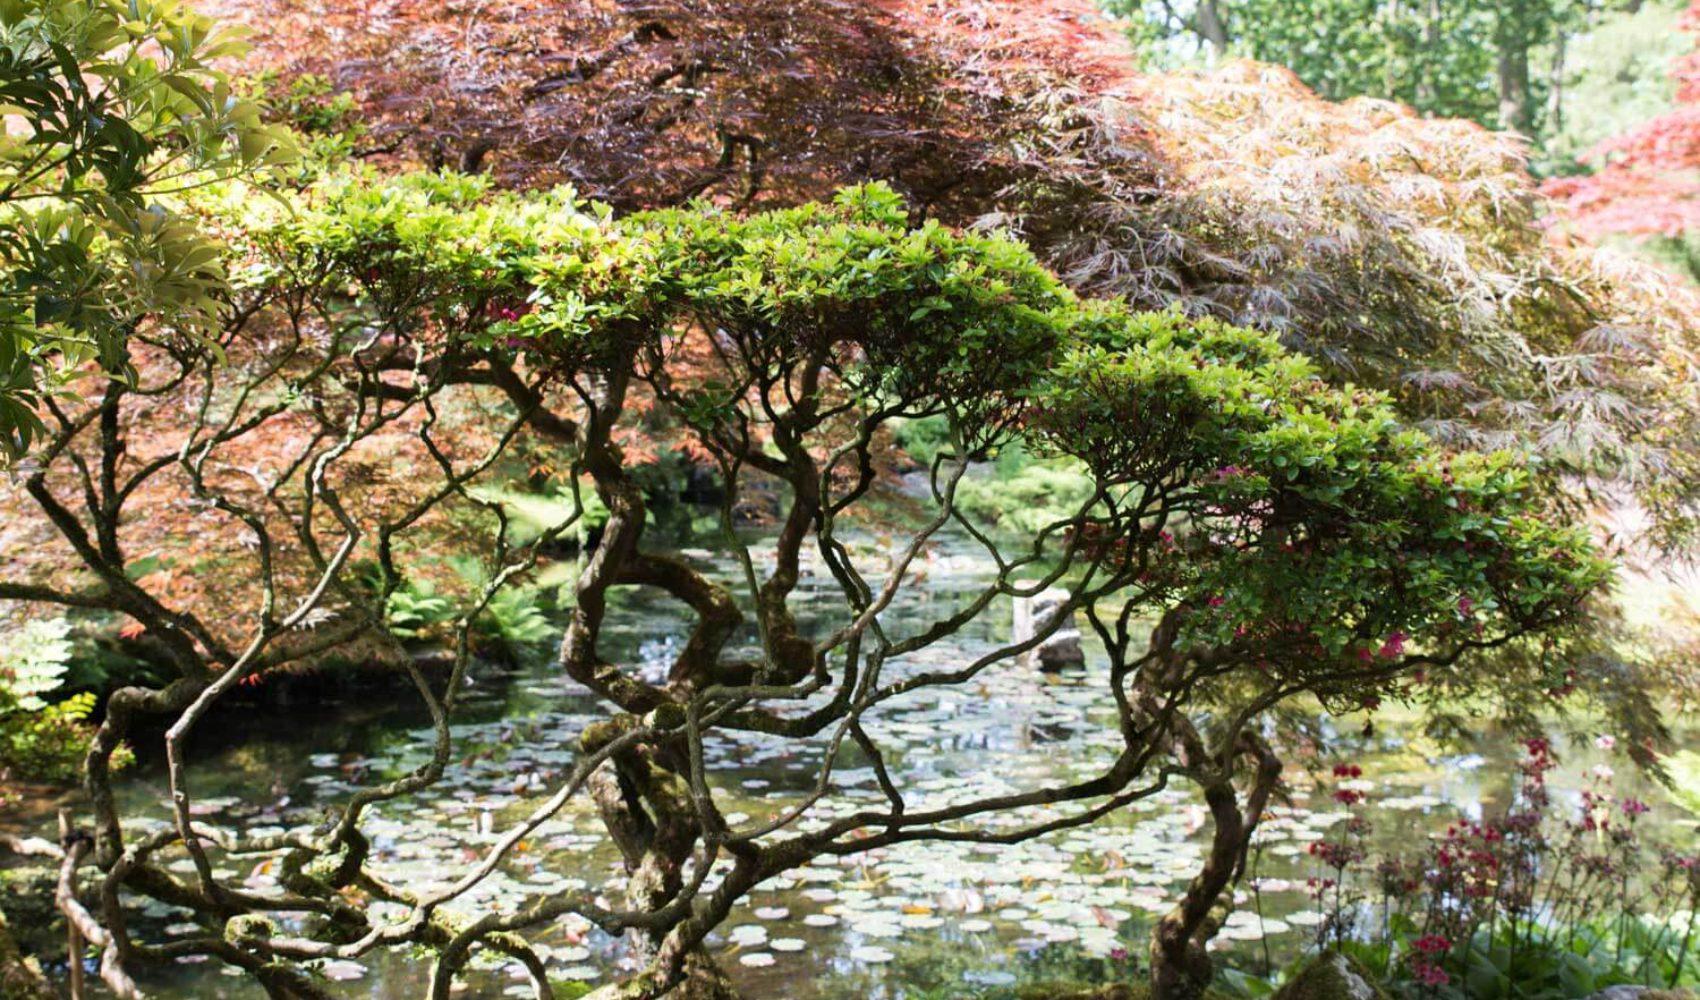 Fototagebuch 3: Japanischer Garten Den Haag